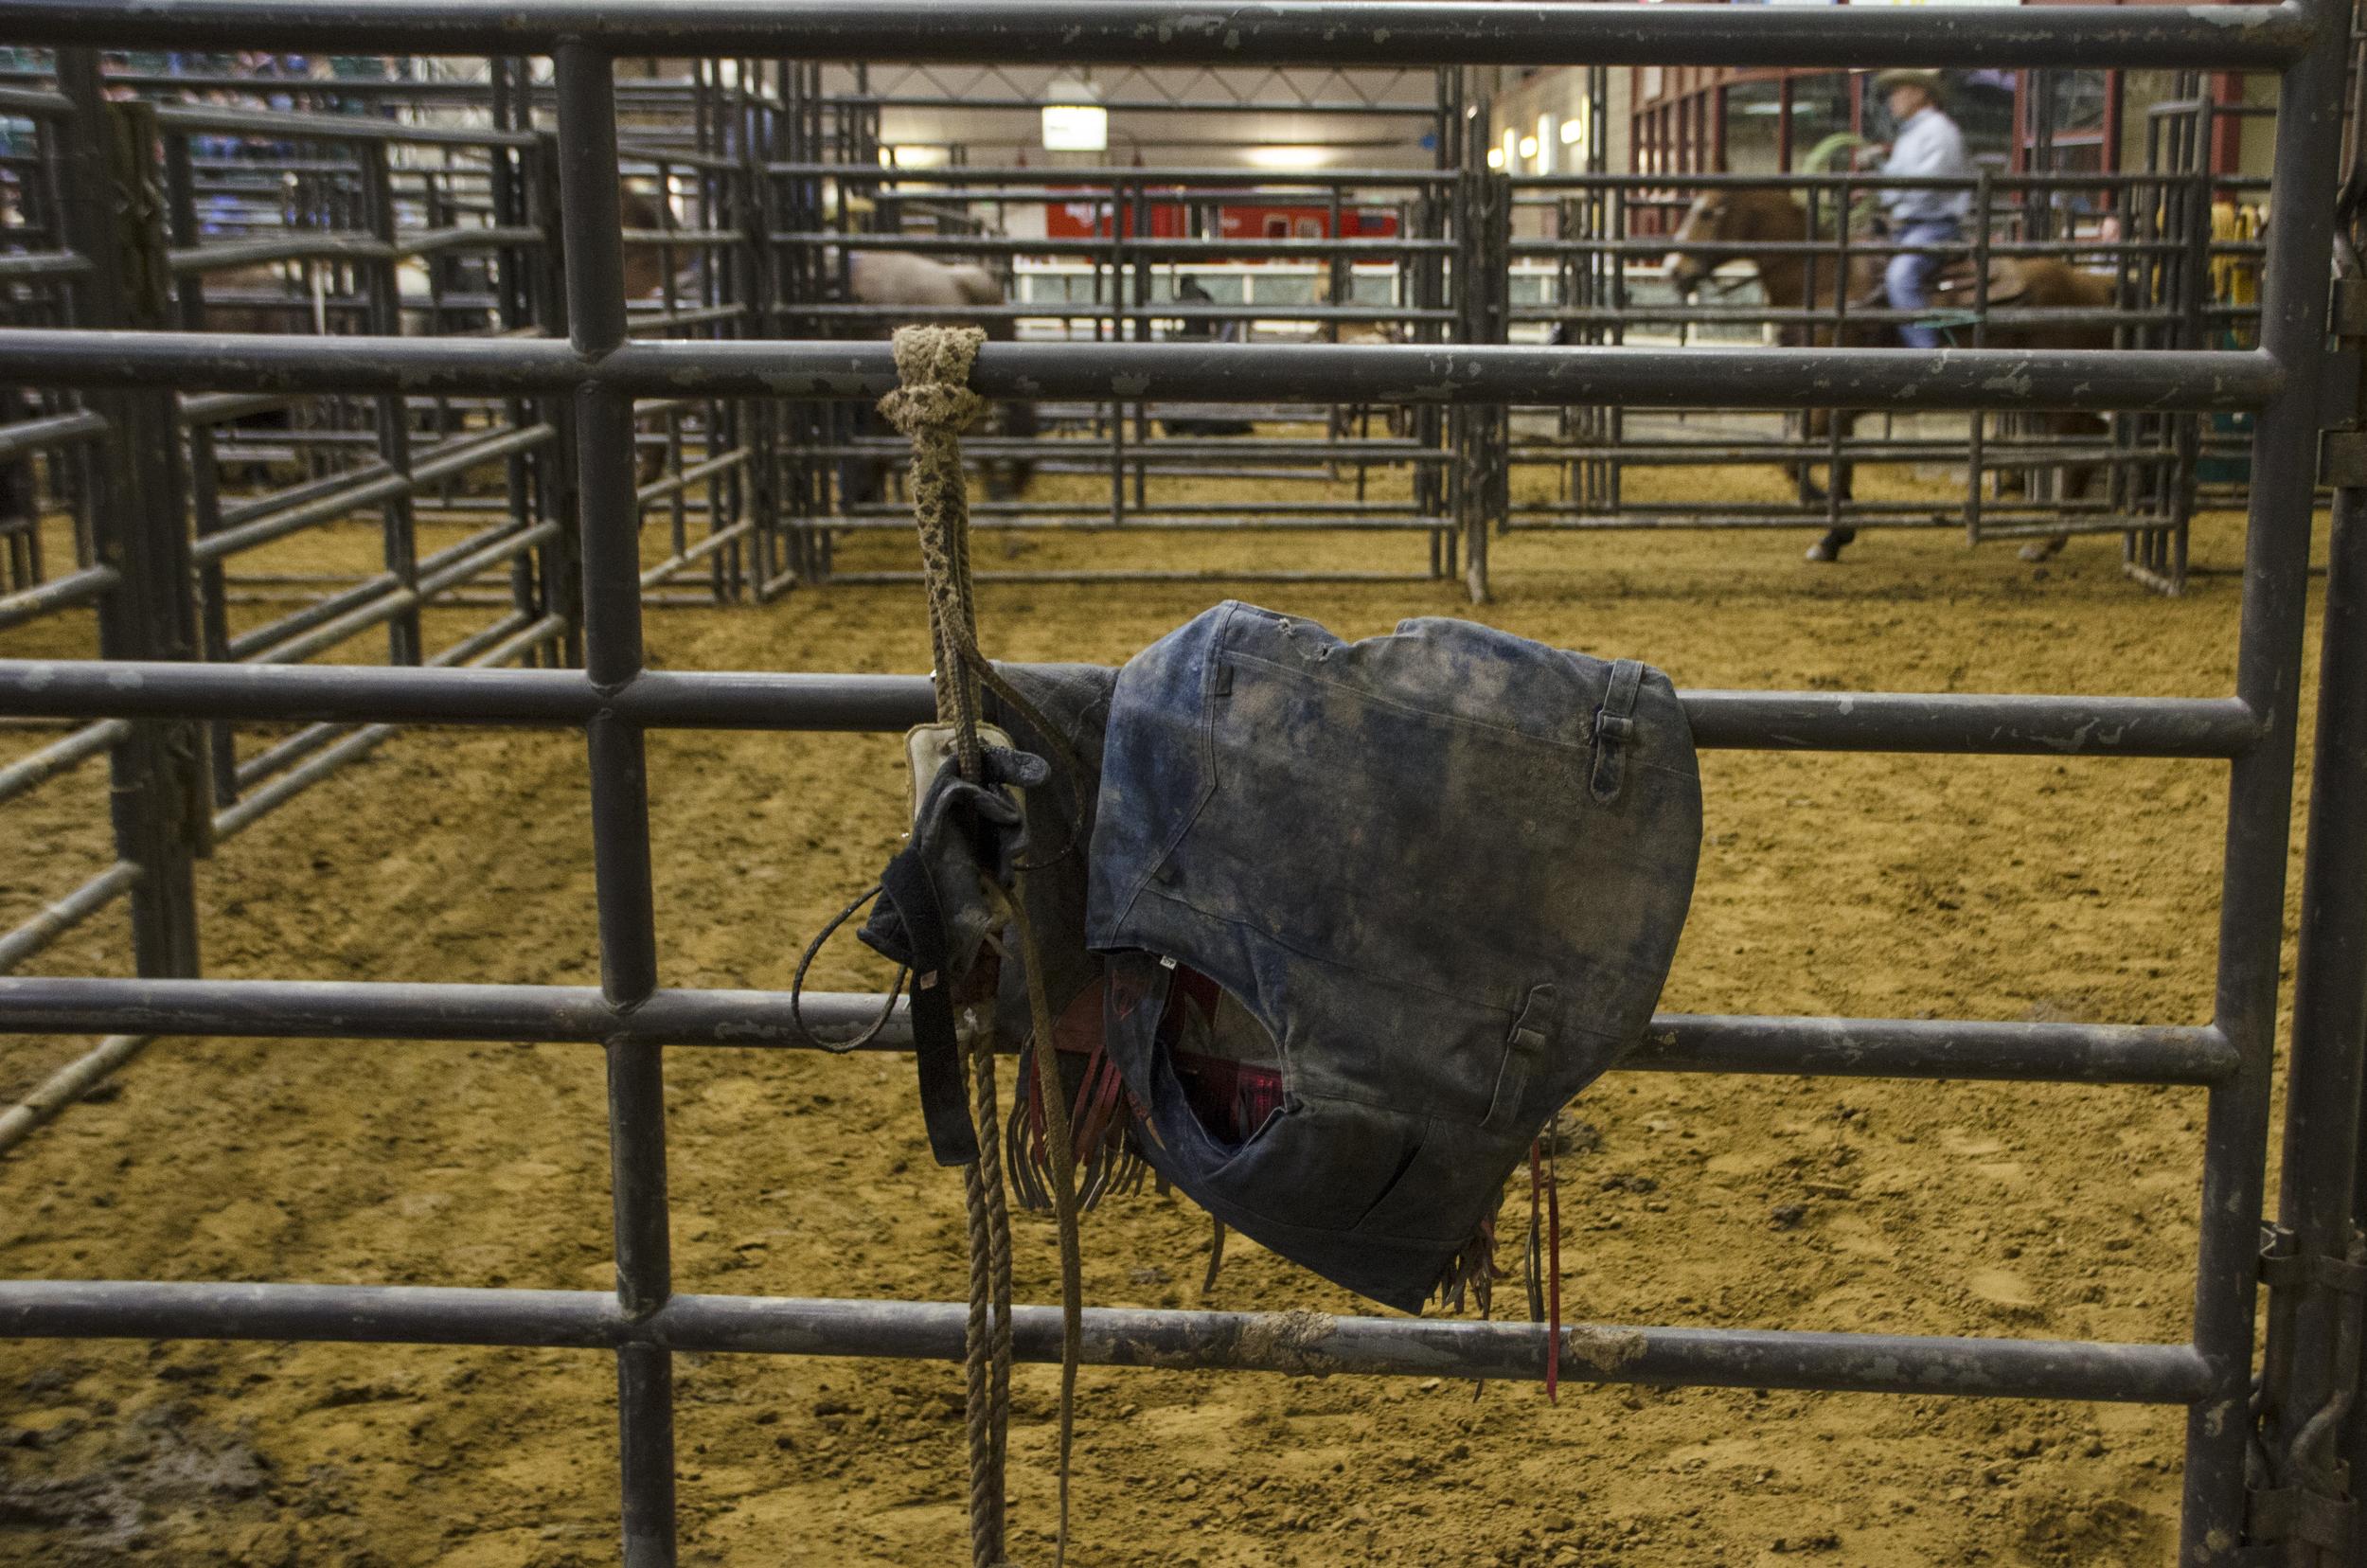 A Cowboy's Gear